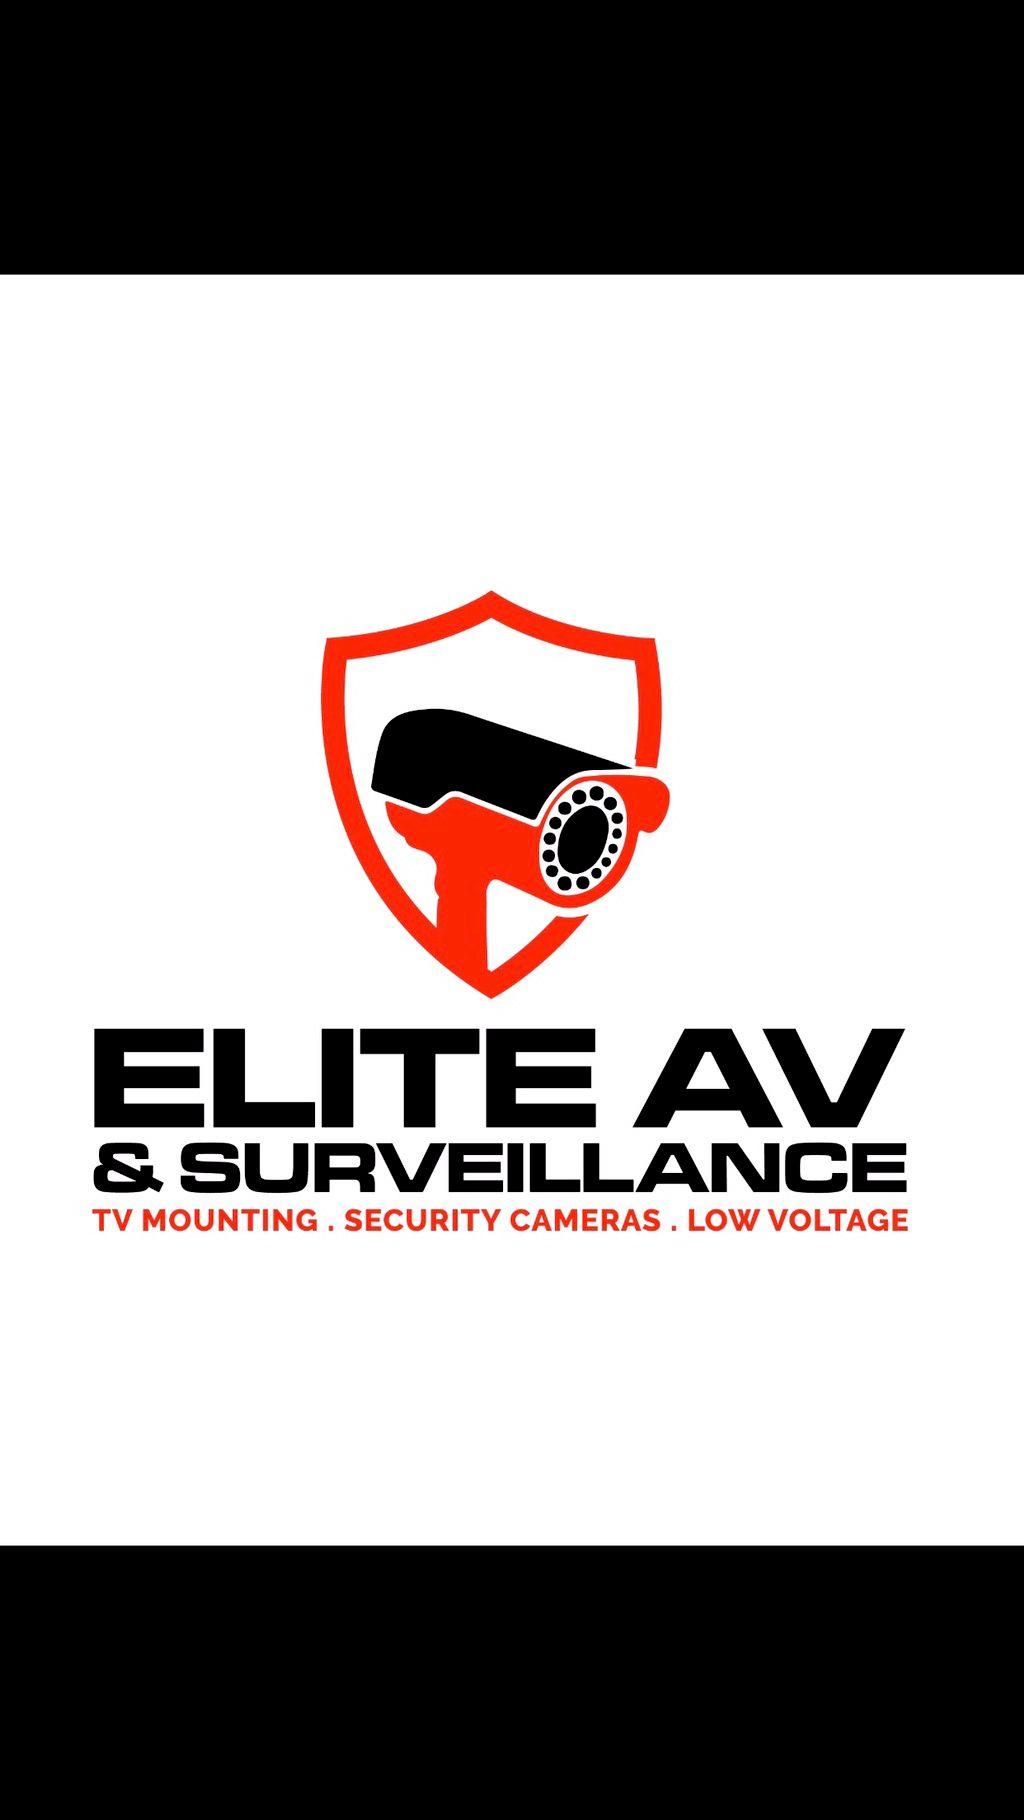 Elite A/V & Surveillance